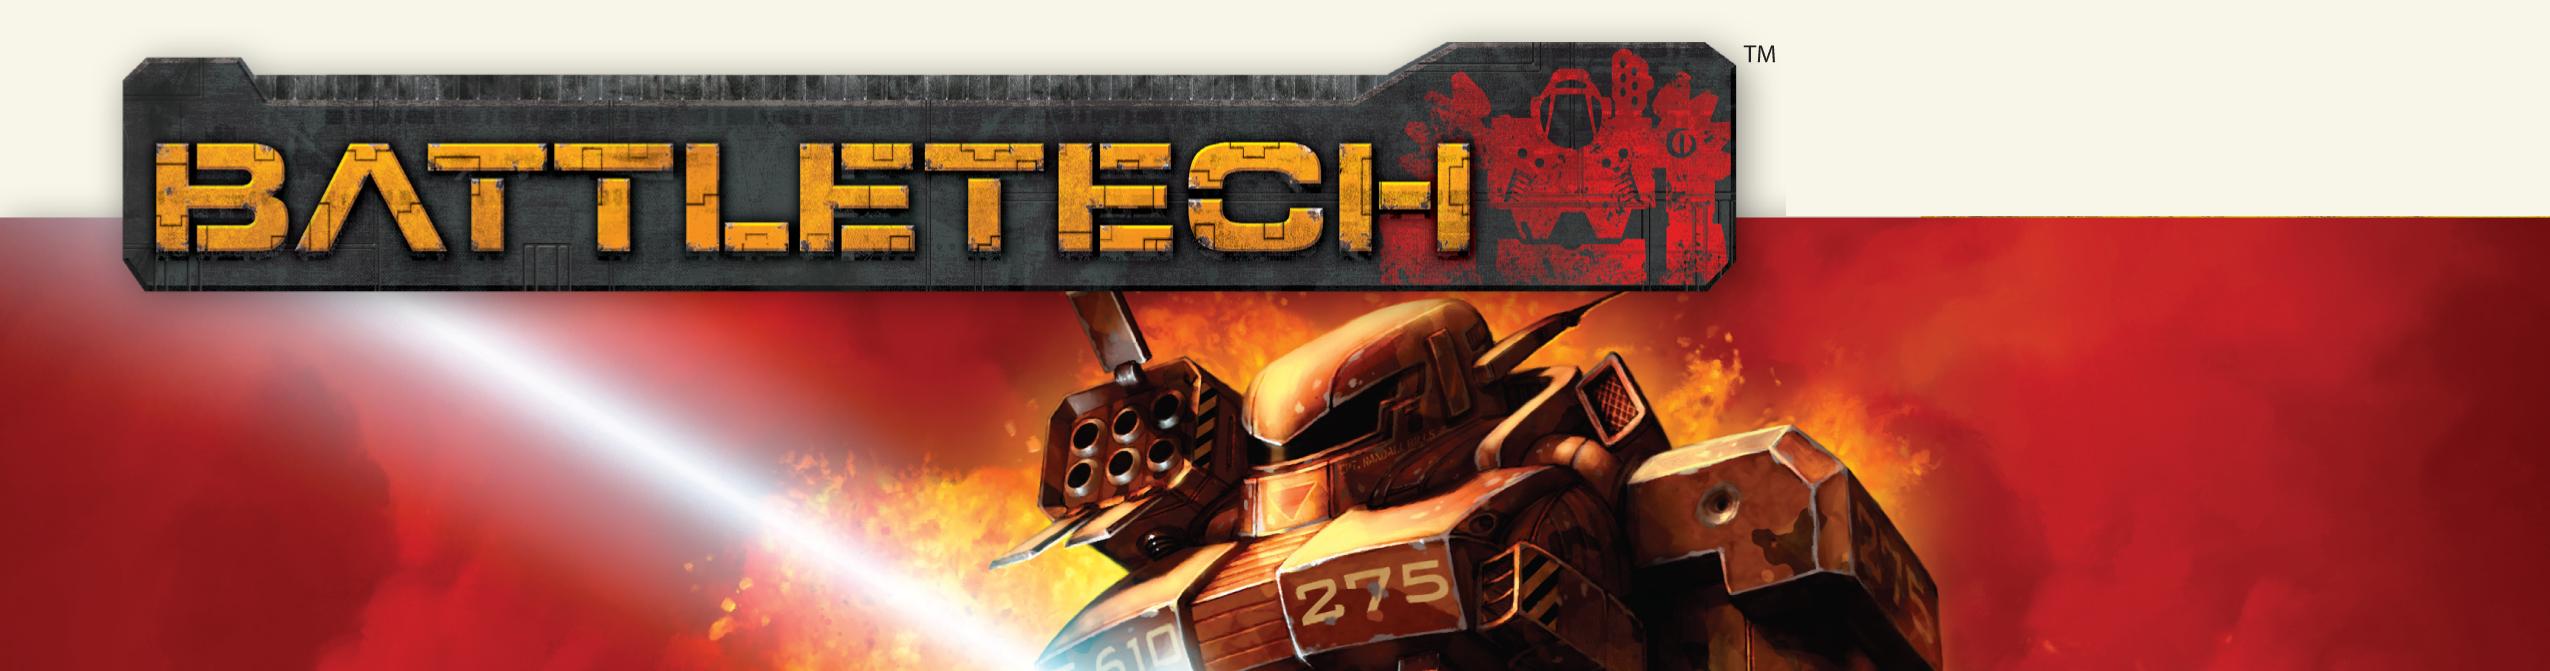 Battletechbanner